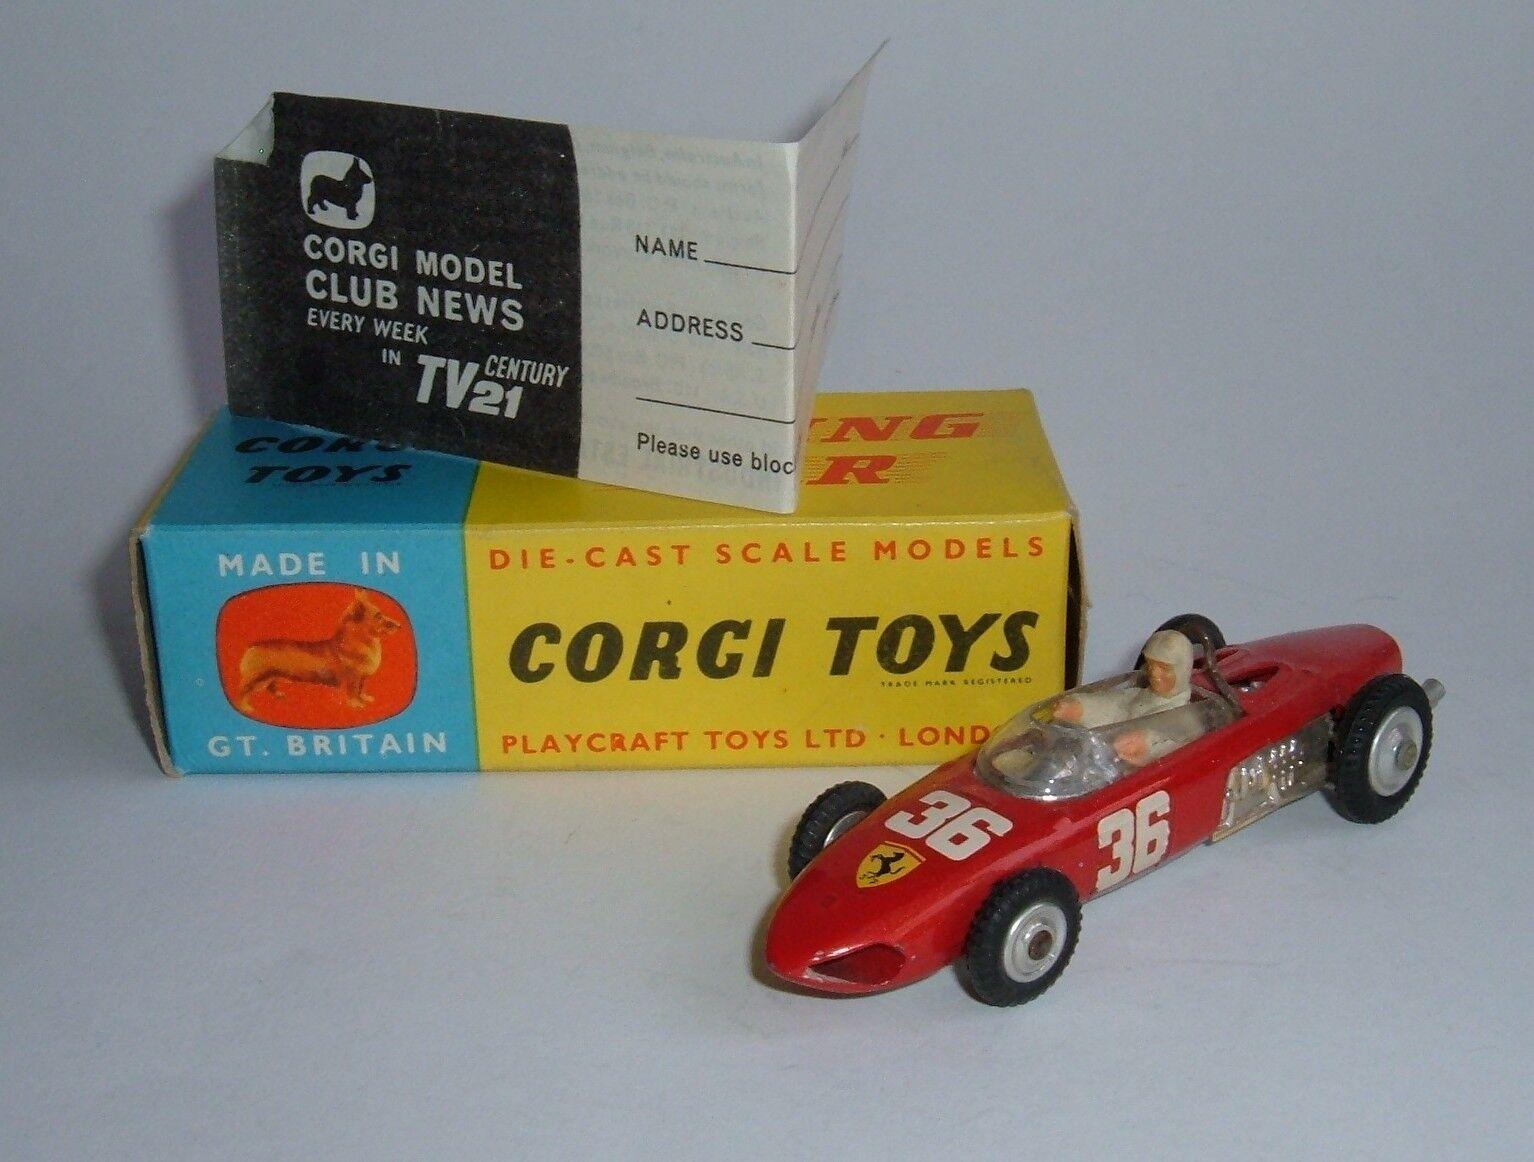 Corgi spielzeug nr. 154, ferrari - formel - 1 - grand - prix rennwagen, - grandios.